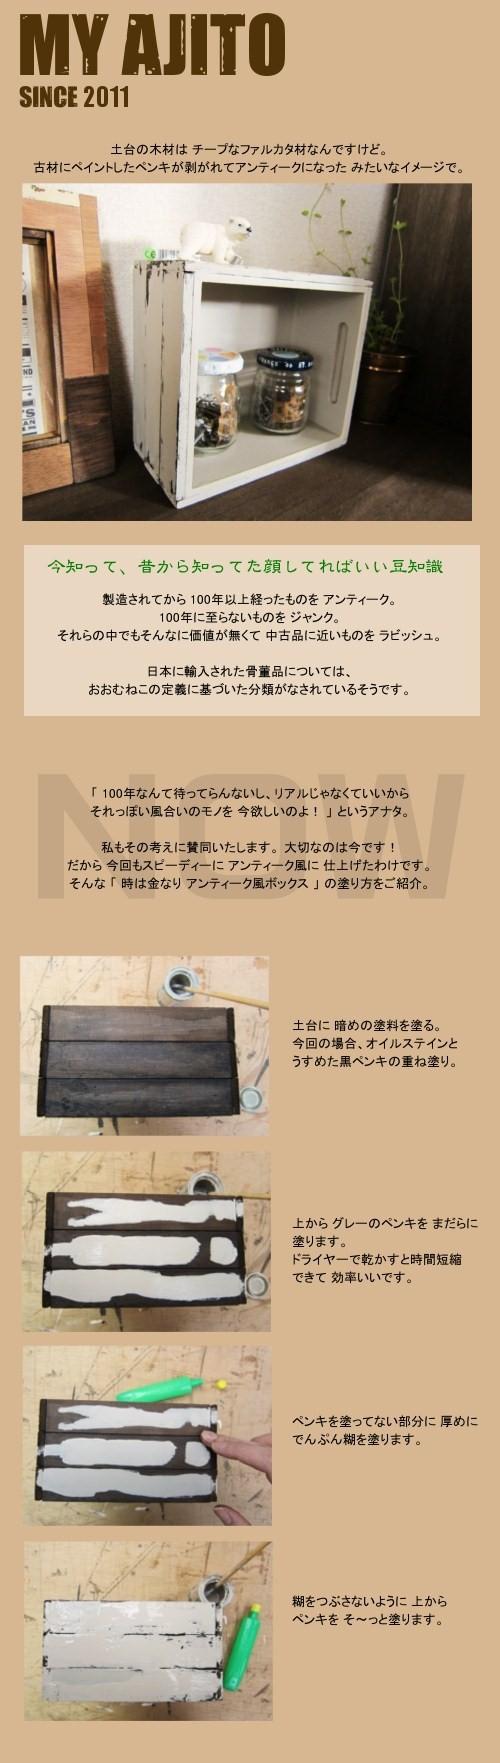 kame_wb_4.jpg